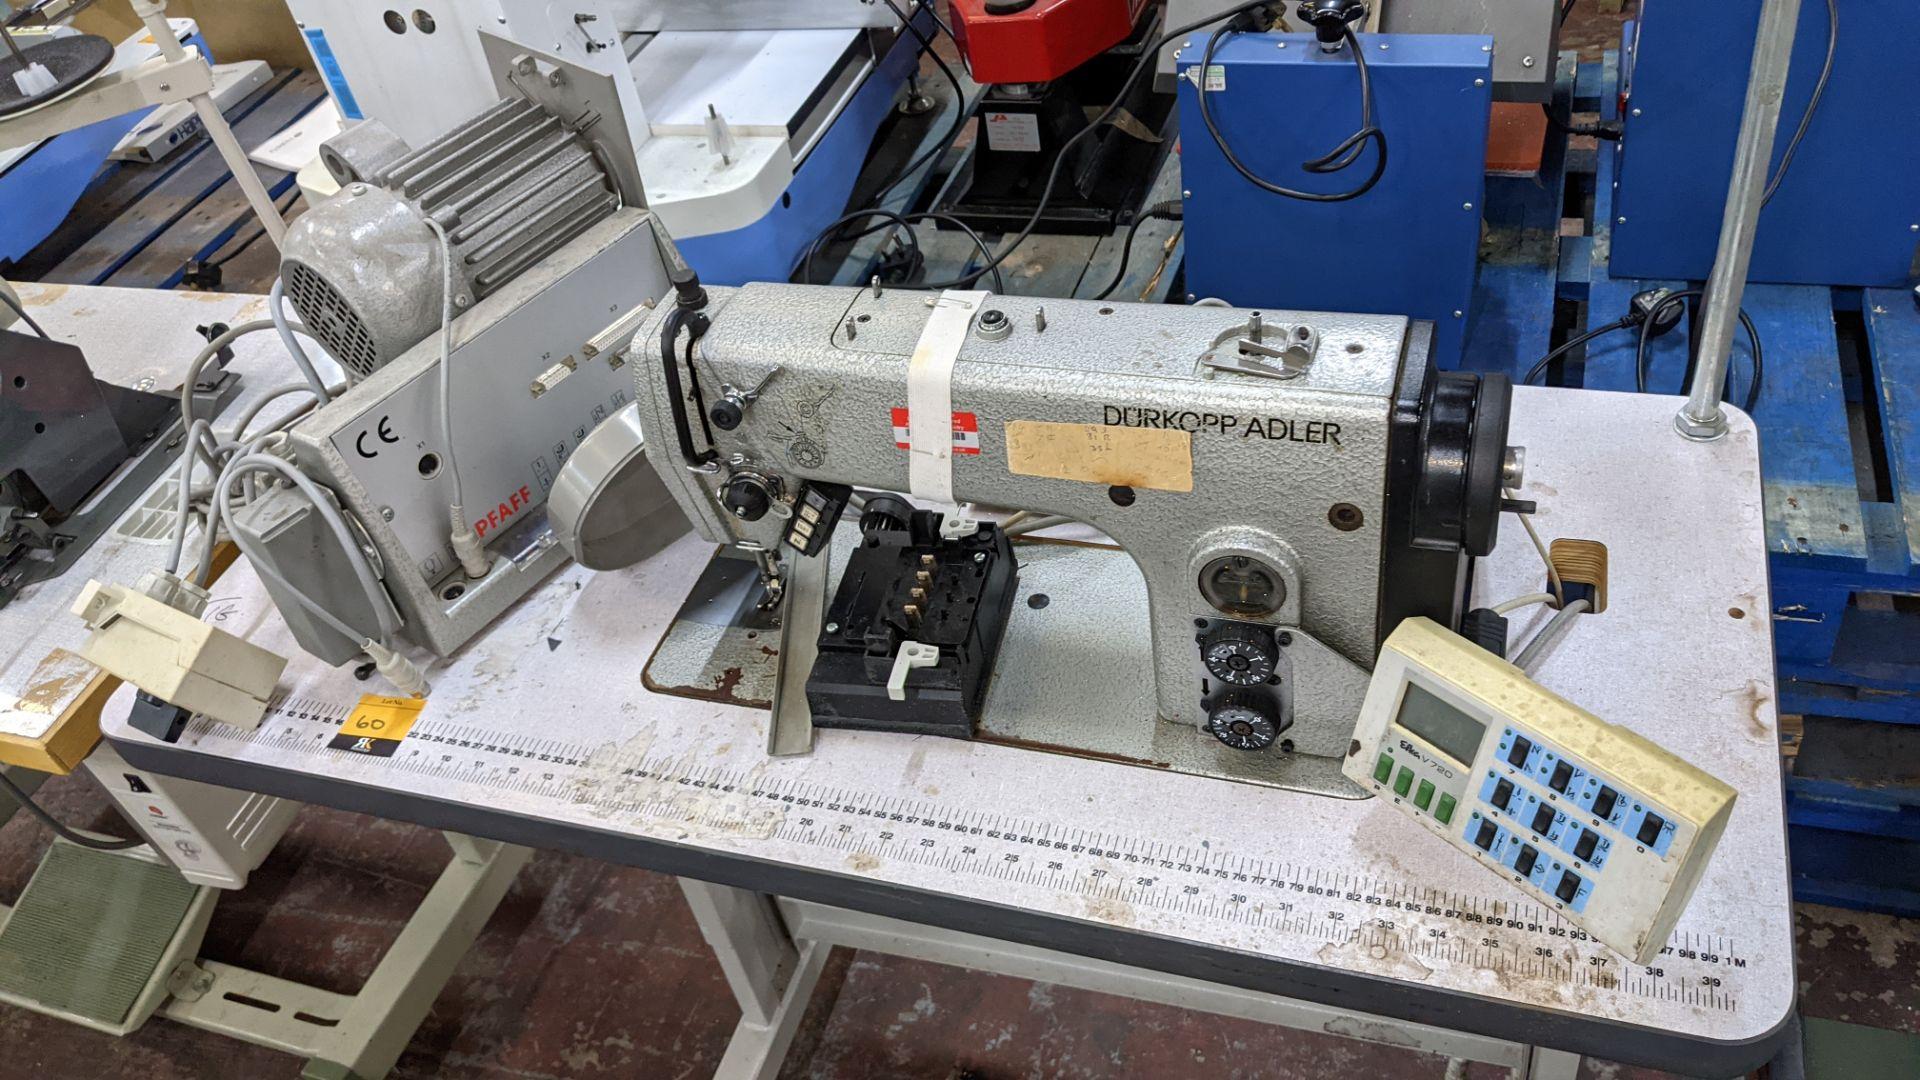 Durkopp Adler type 0271-L40042 sewing machine - Image 19 of 19